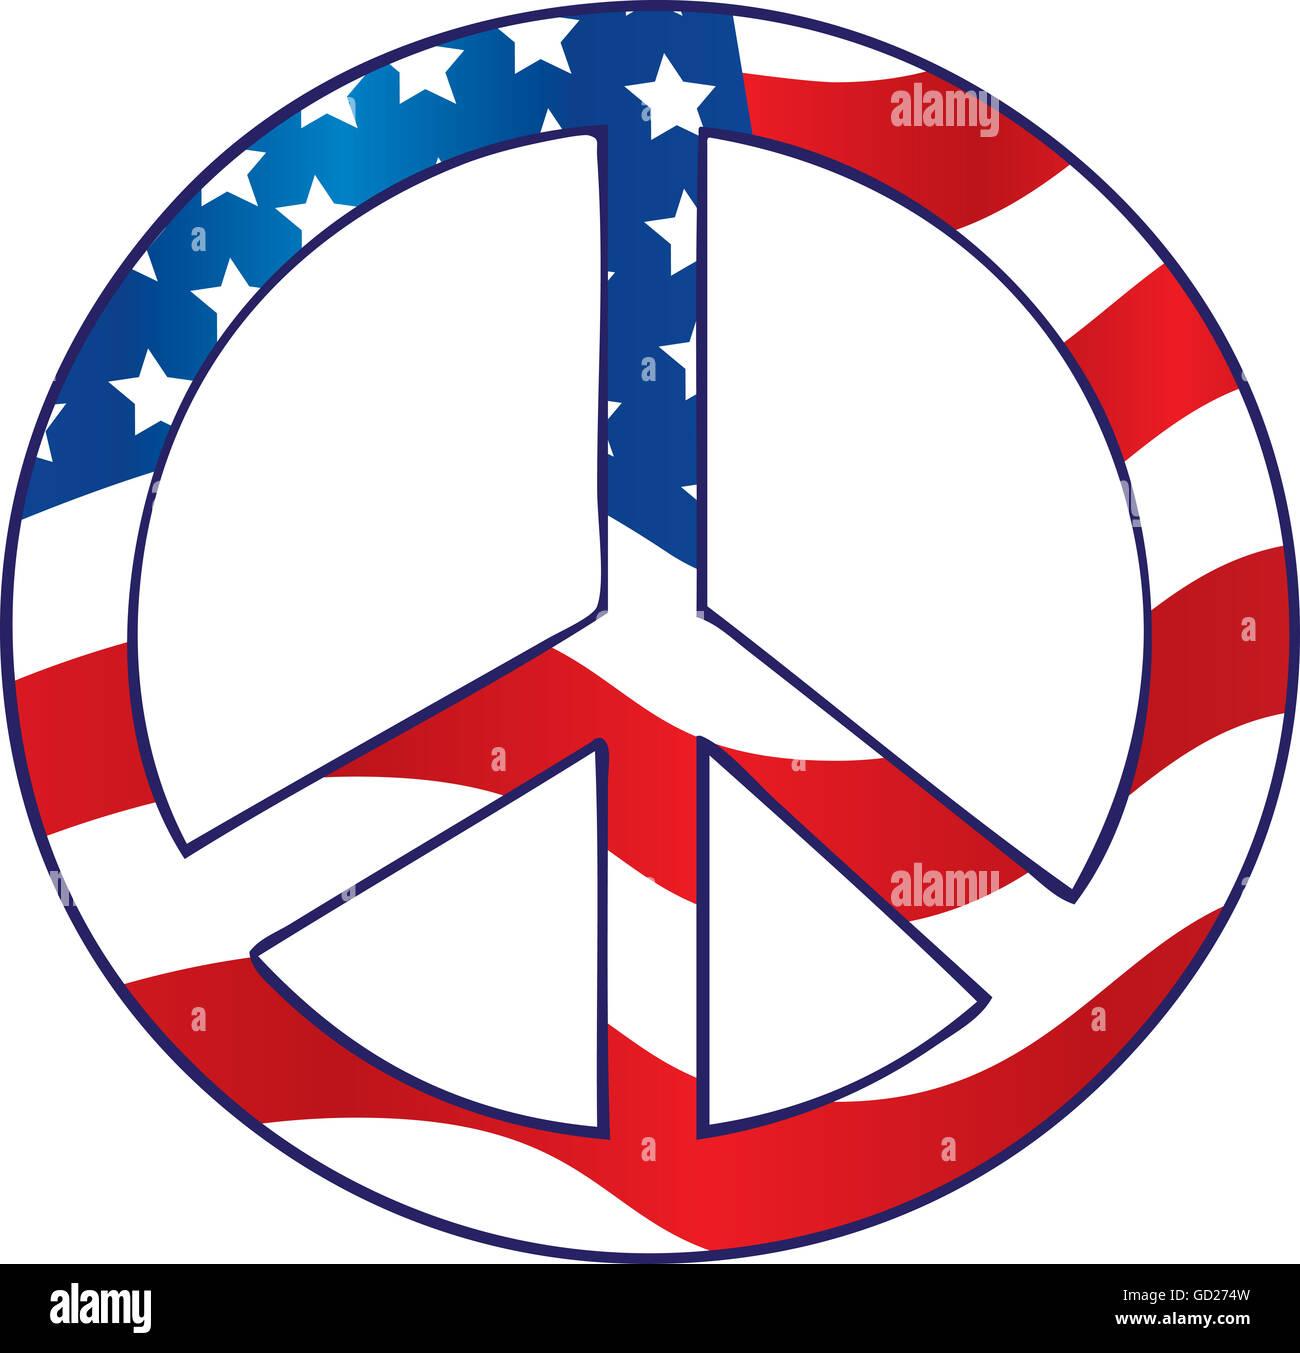 American flag peace sign stock photo 111302265 alamy american flag peace sign biocorpaavc